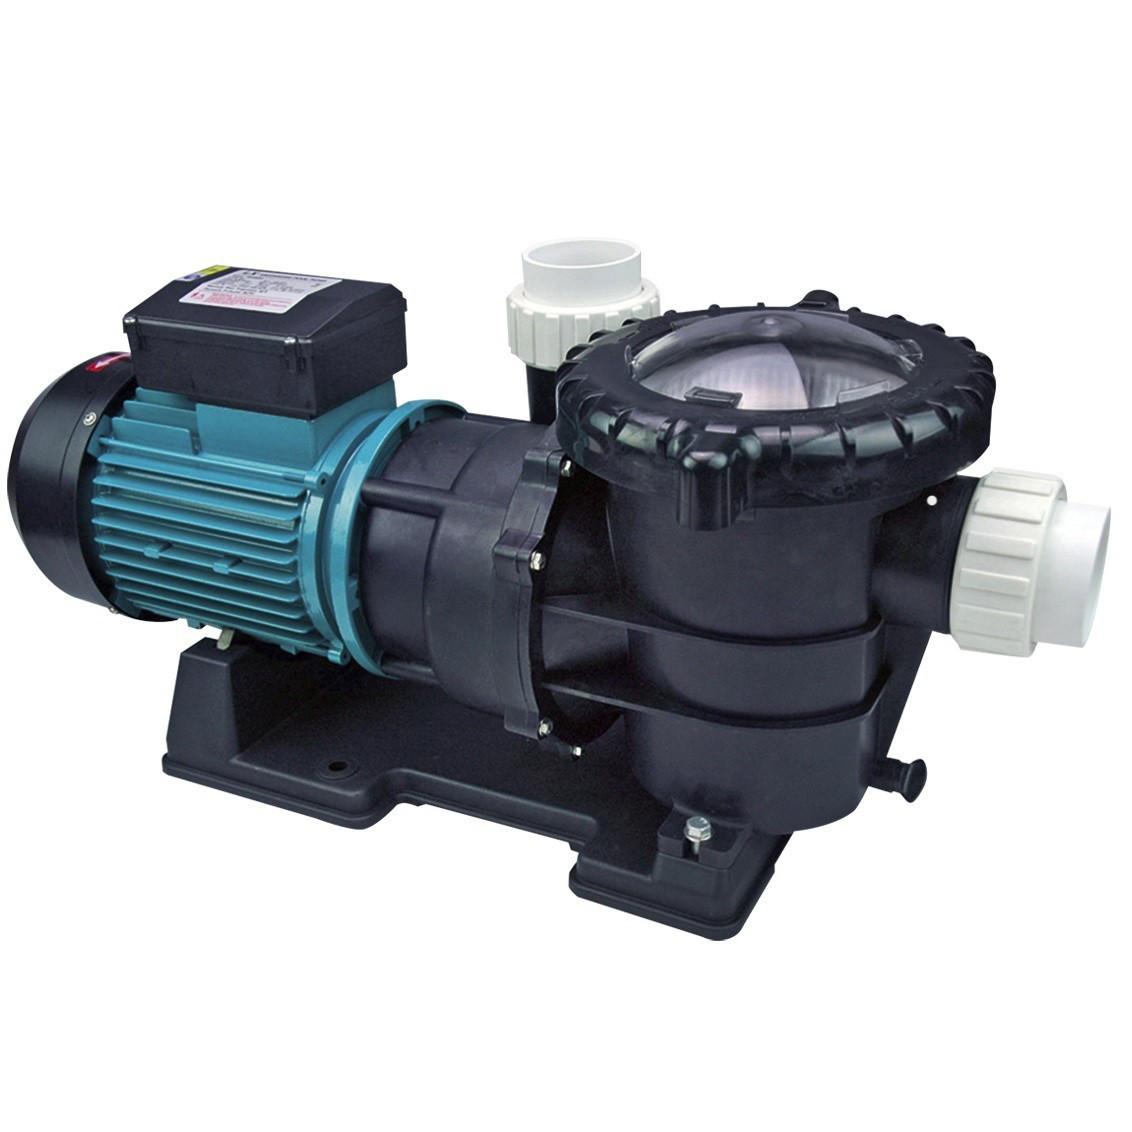 Насос AquaViva LX STP300M/VWS300M 30 м3/ч